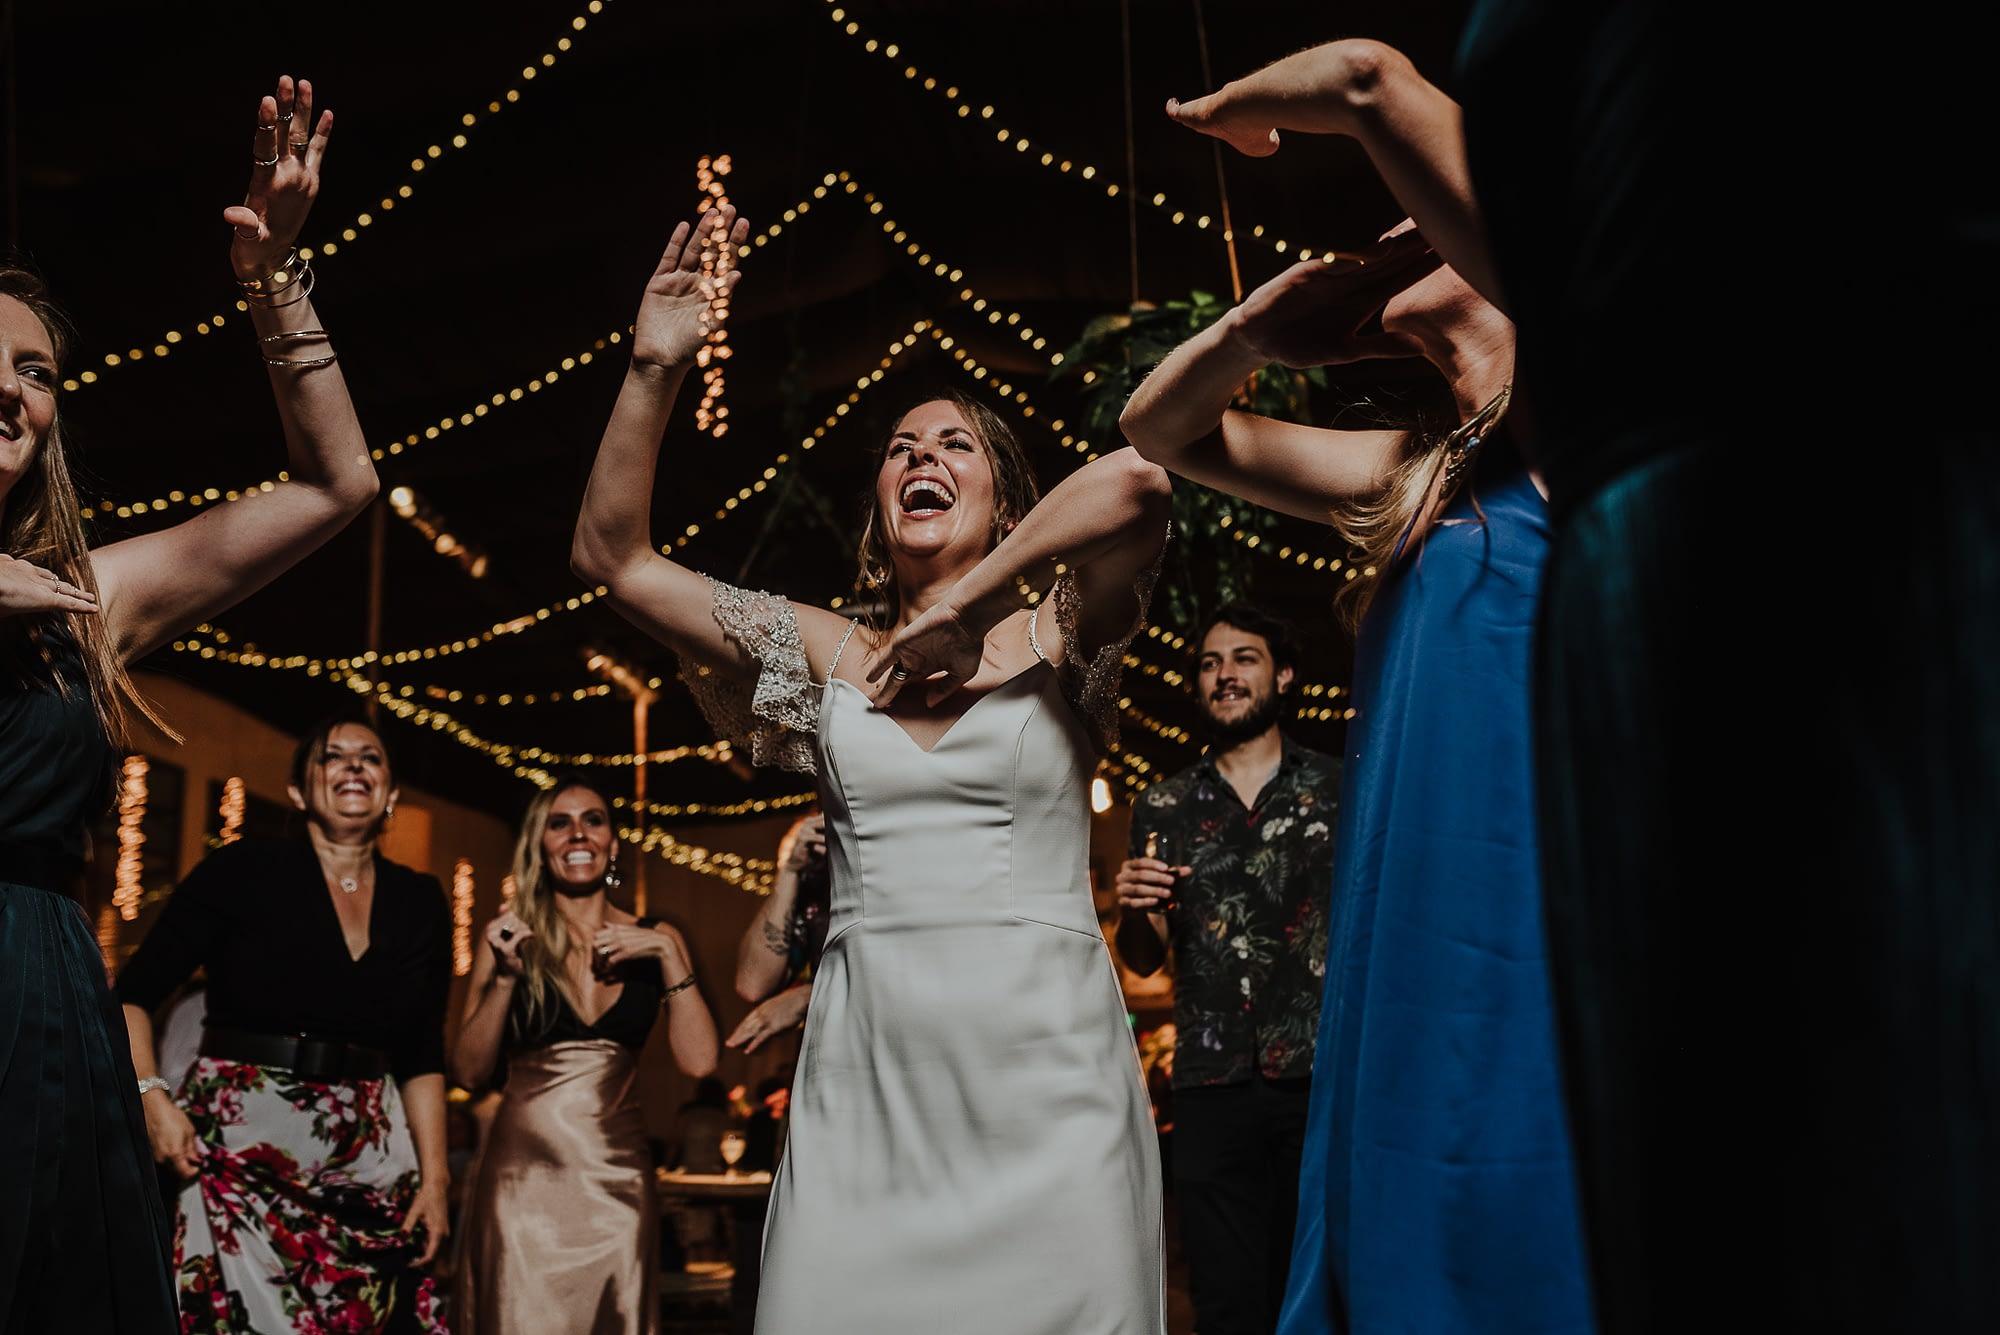 fotografo de matrimonios-los ingleses de chicureo-fiesta